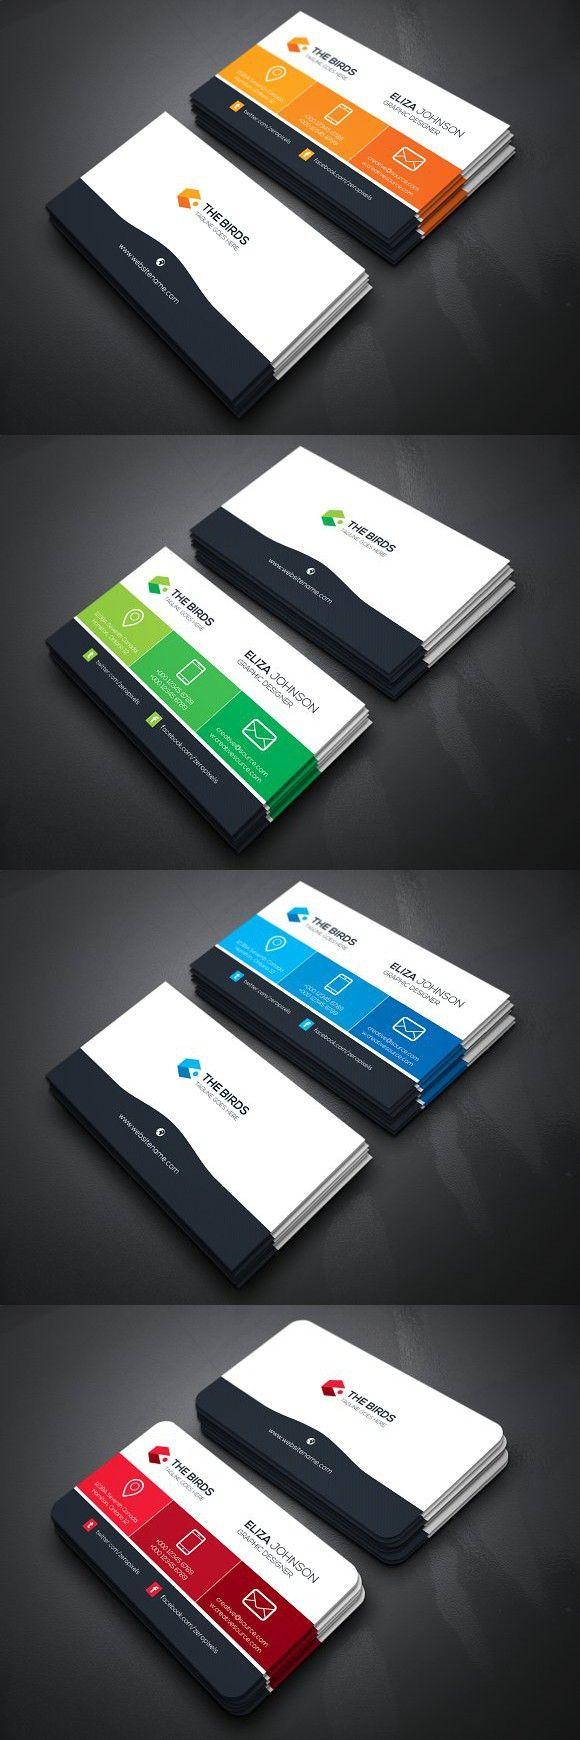 Business Cards #black